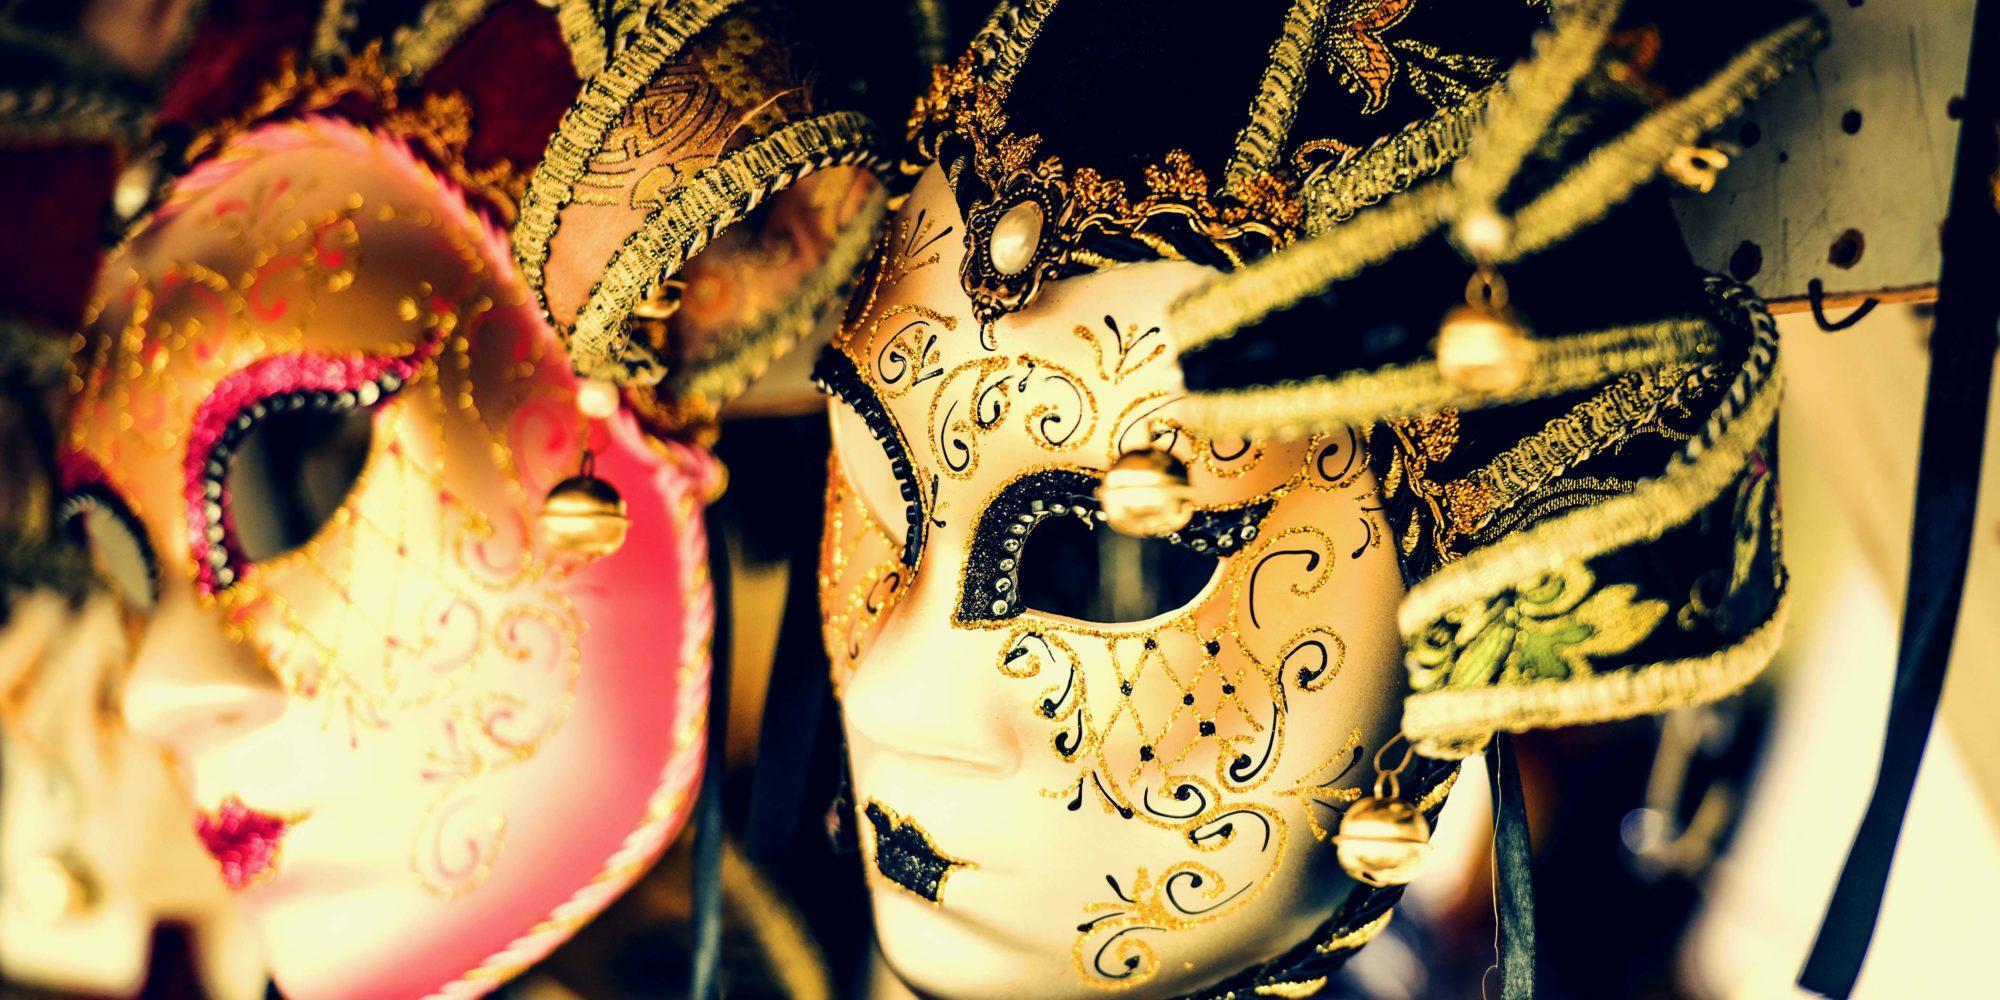 Venetian carnival masks are beautiful decorated